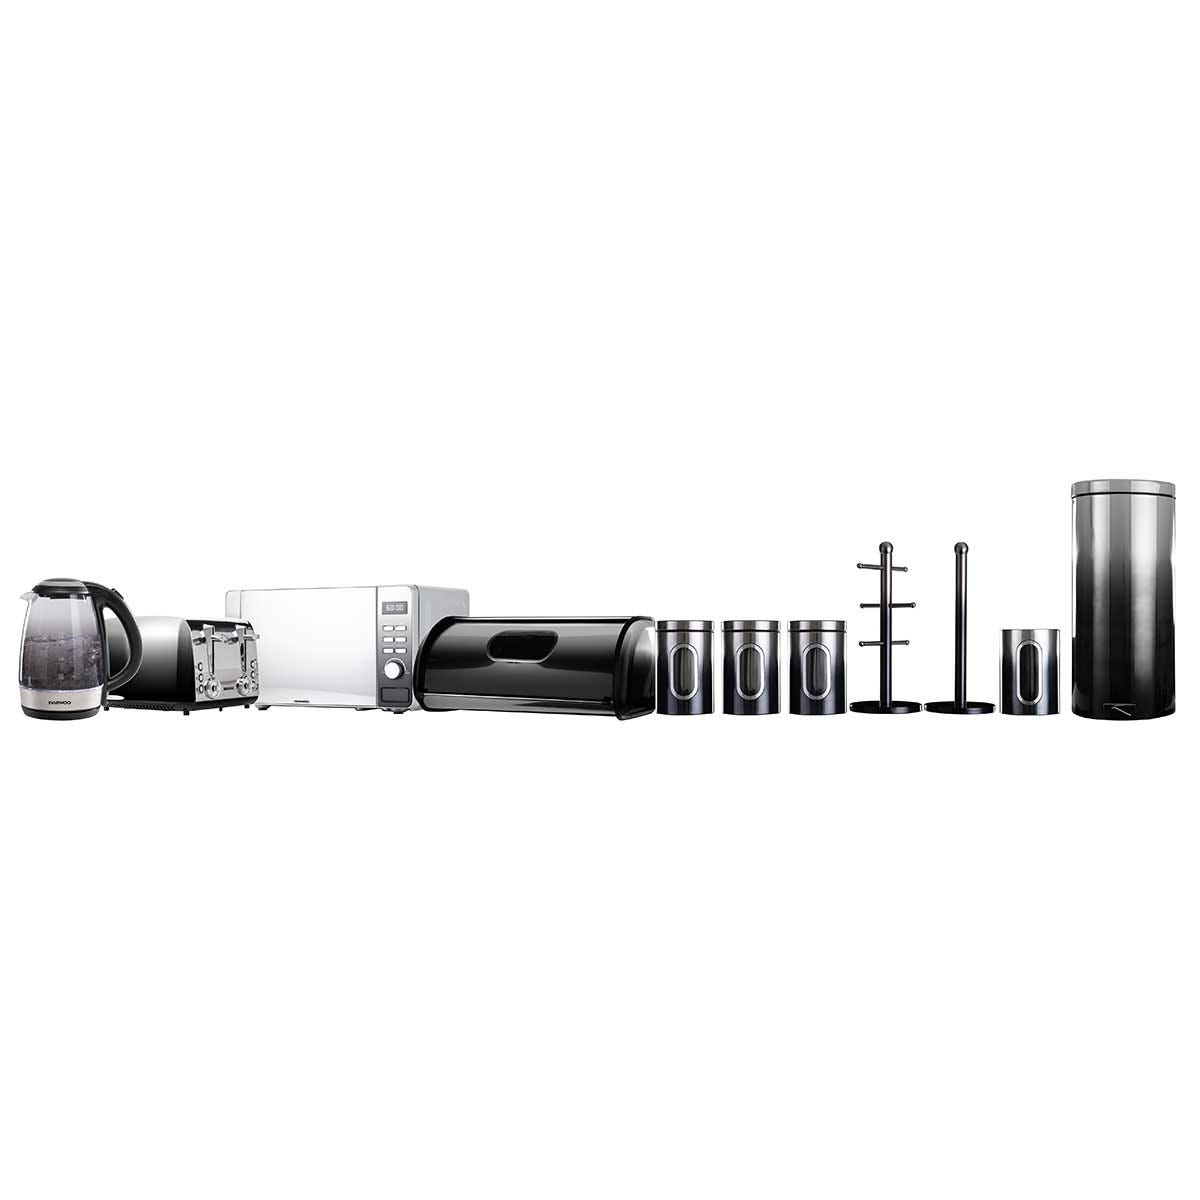 Daewoo SDA2397DS Callisto 2200W Glass Kettle, 4 Slice Toaster, 800W Digital Microwave, Bread Bin, Set of 3 Canisters, Mug Tree, Towel Holder, Utensil Pot and 30L Pedal Bin - Black